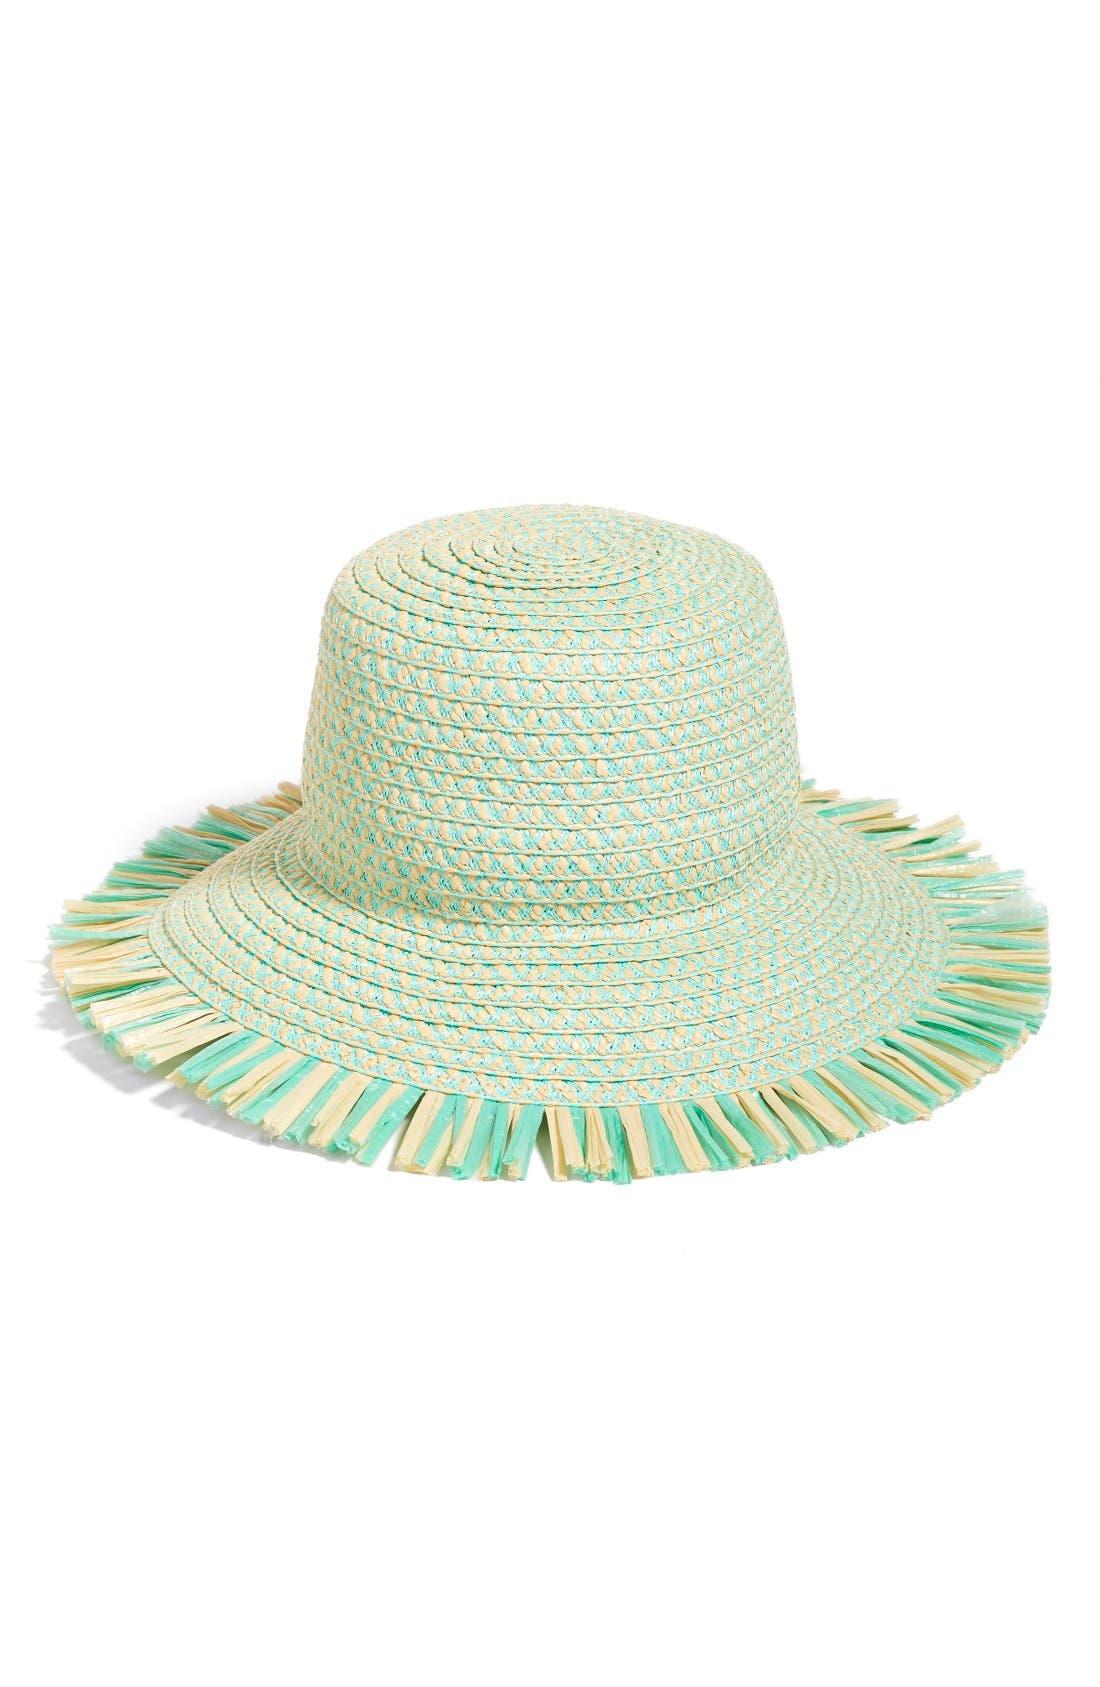 'TIKI' BUCKET HAT - GREEN